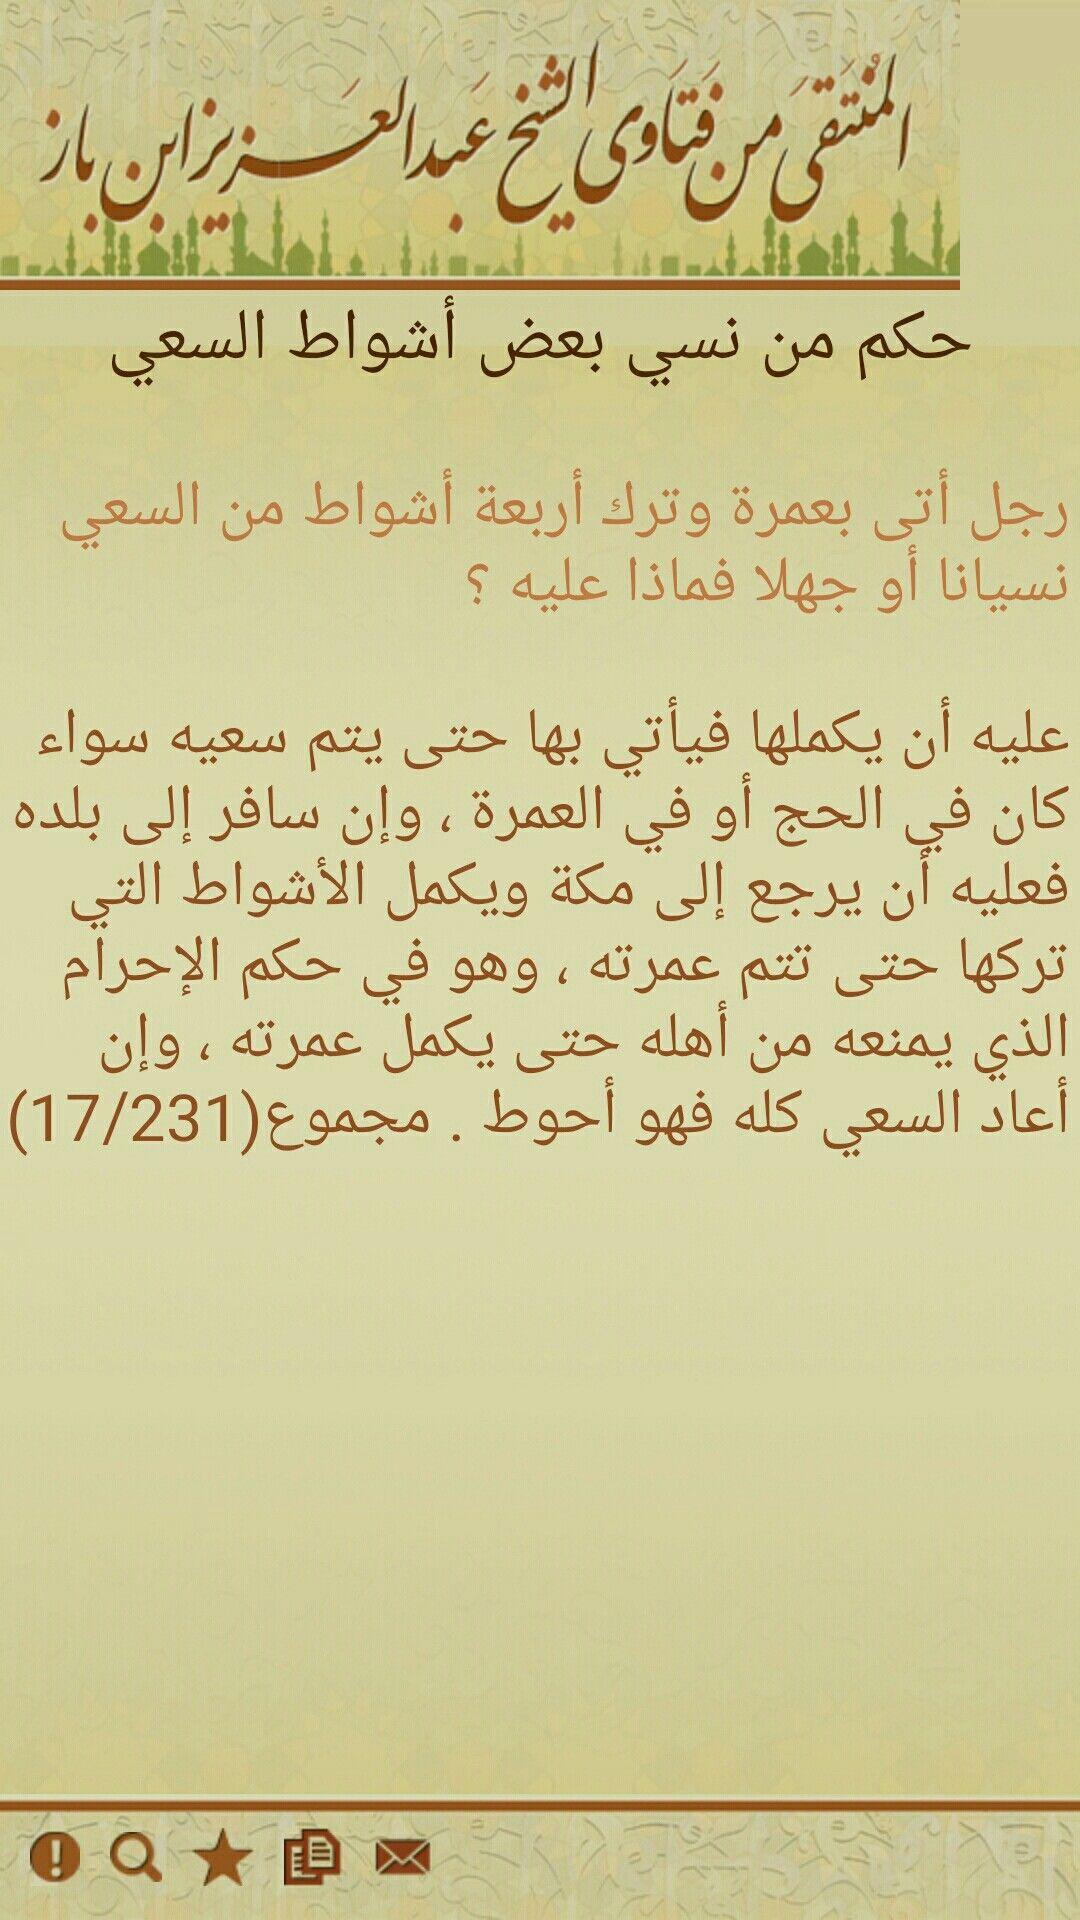 Pin By العلم الشرعي بين يديك أبوعبدال On العلم الشرعي توحيد و سنة Arabic Calligraphy Calligraphy Iyo